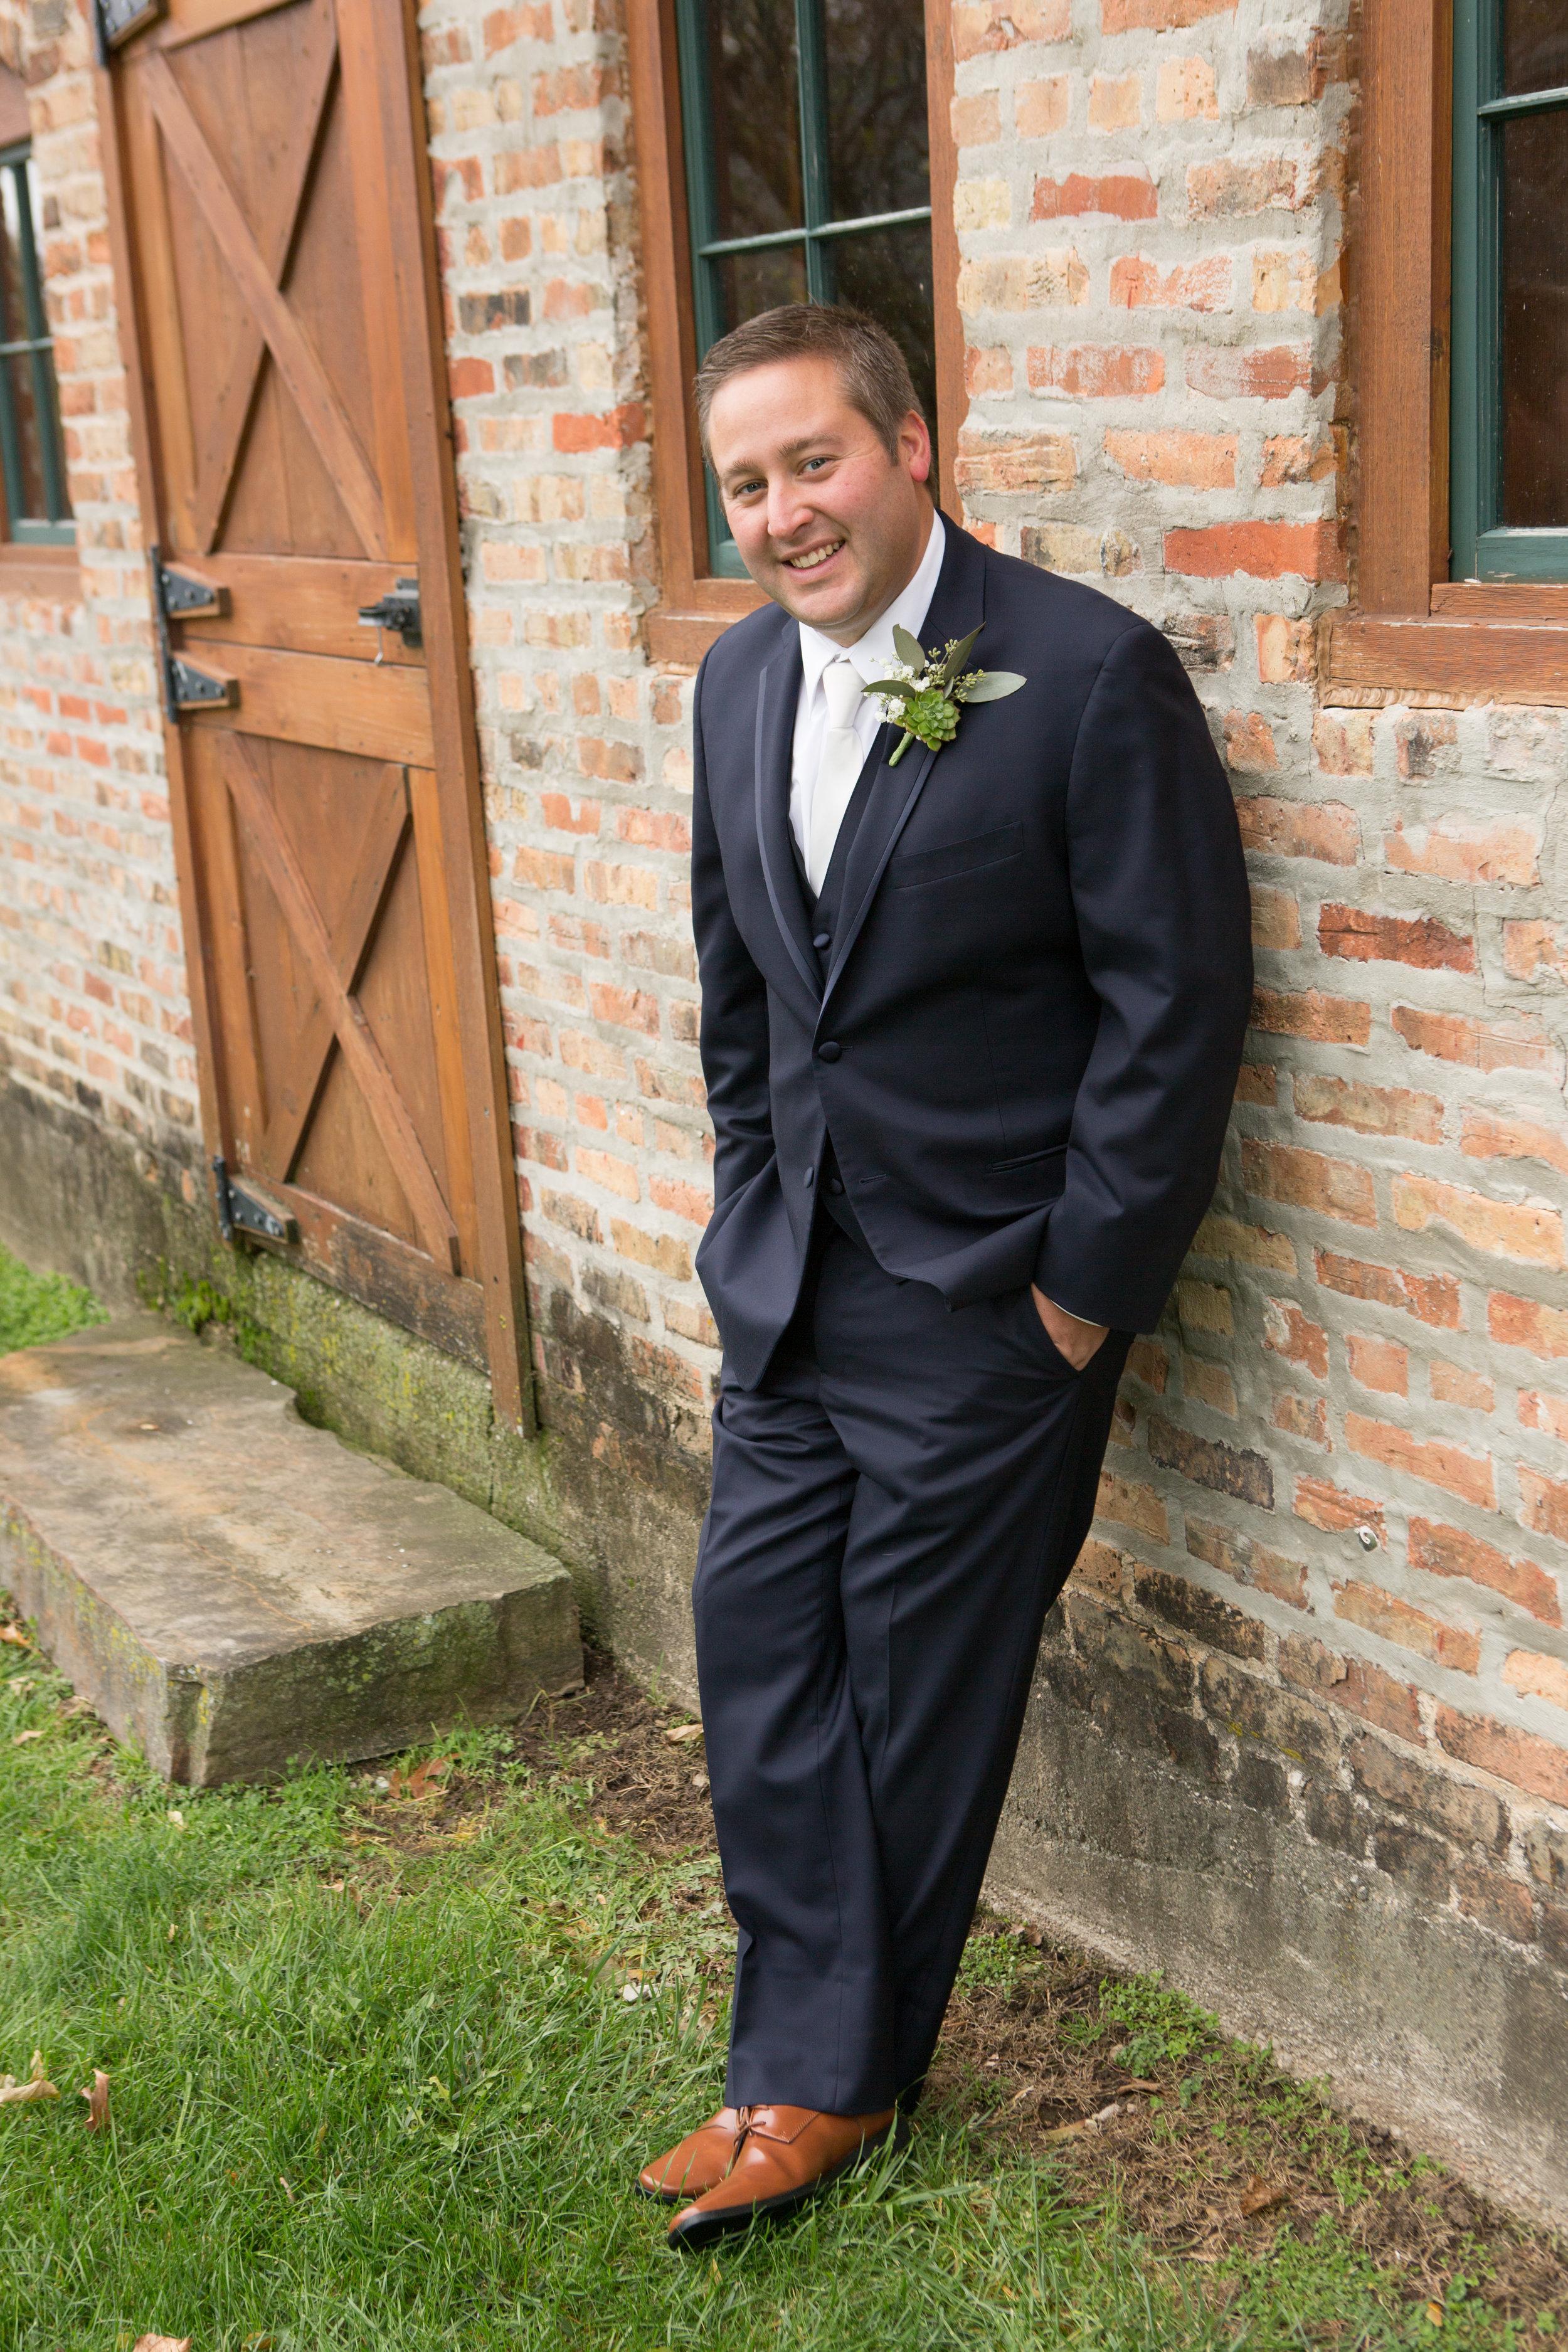 2017-10-28_Kathryn_Ryan_Wedding-195.JPG